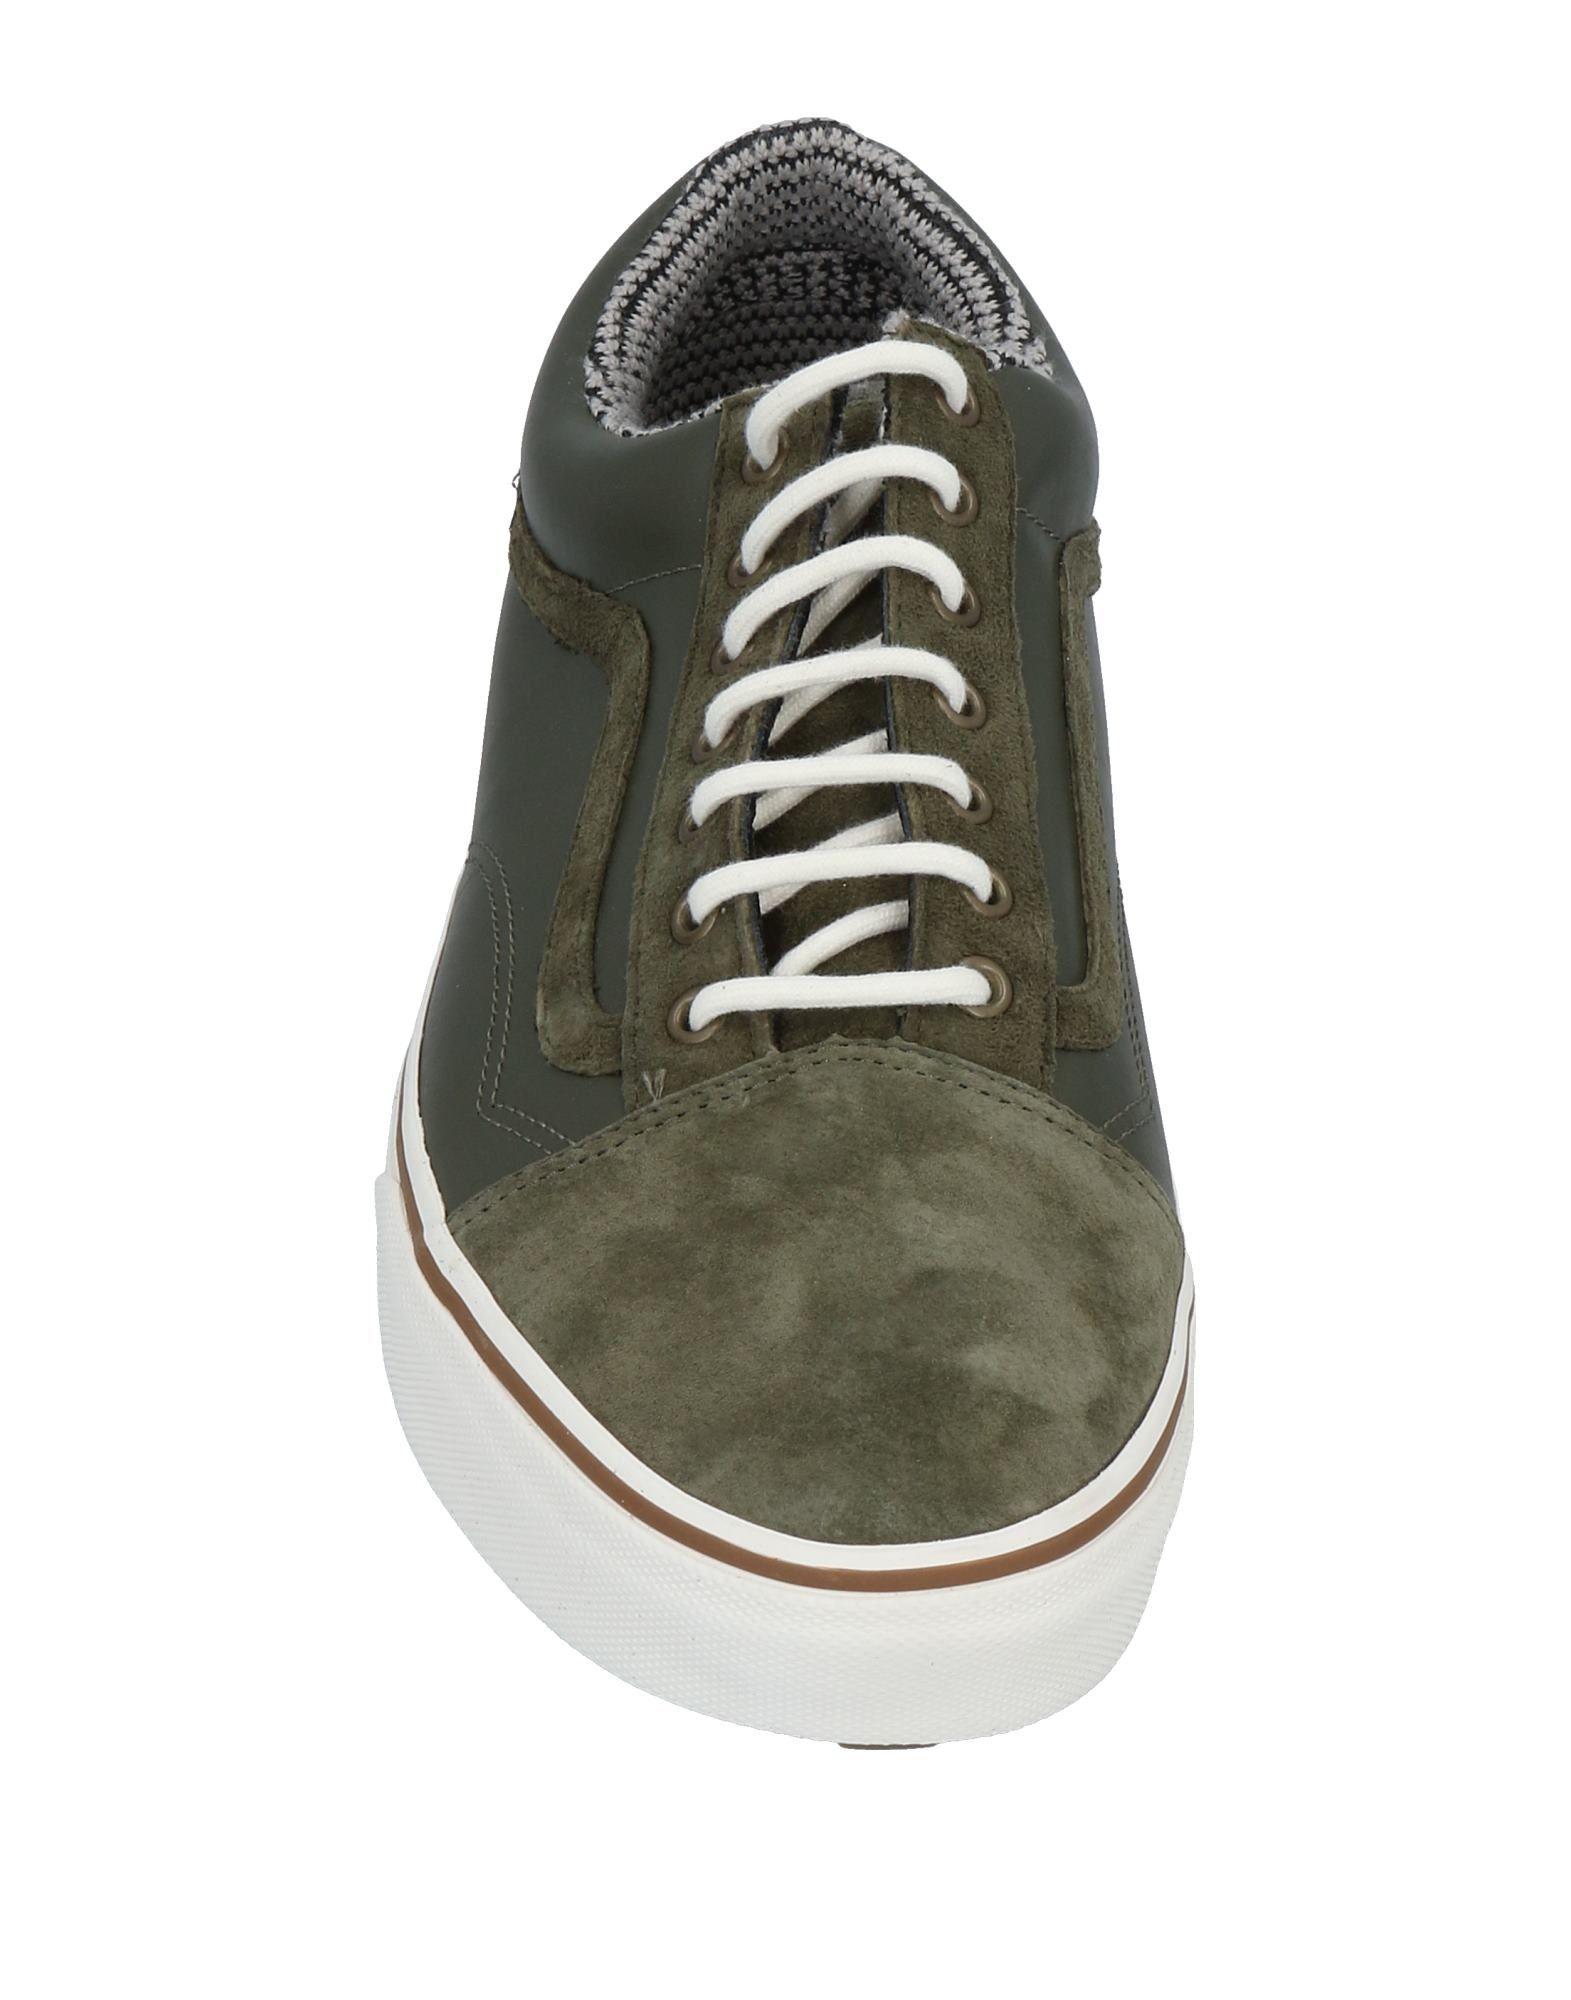 Moda Moda Moda Sneakers Vans Uomo - 11491775JA 0c2e24